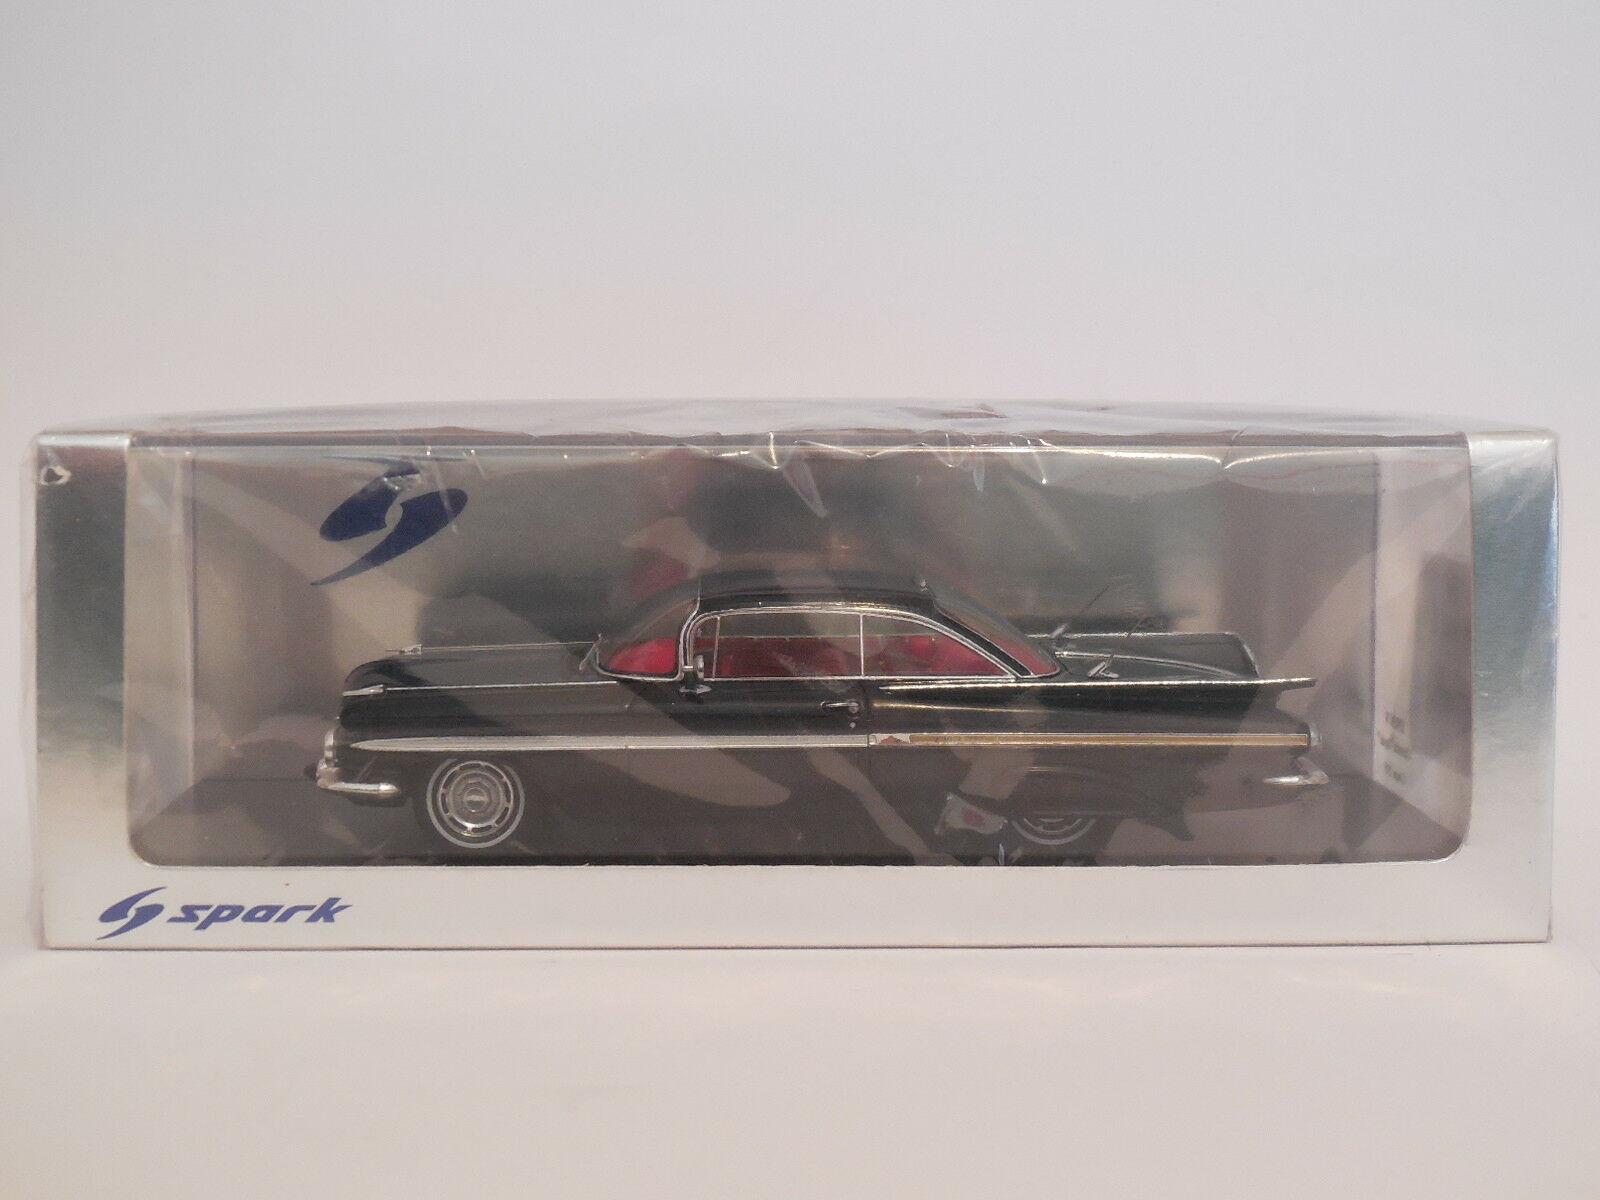 1/43 Spark S2902MCW Chevrolet Impala Coupe 2018 Negro